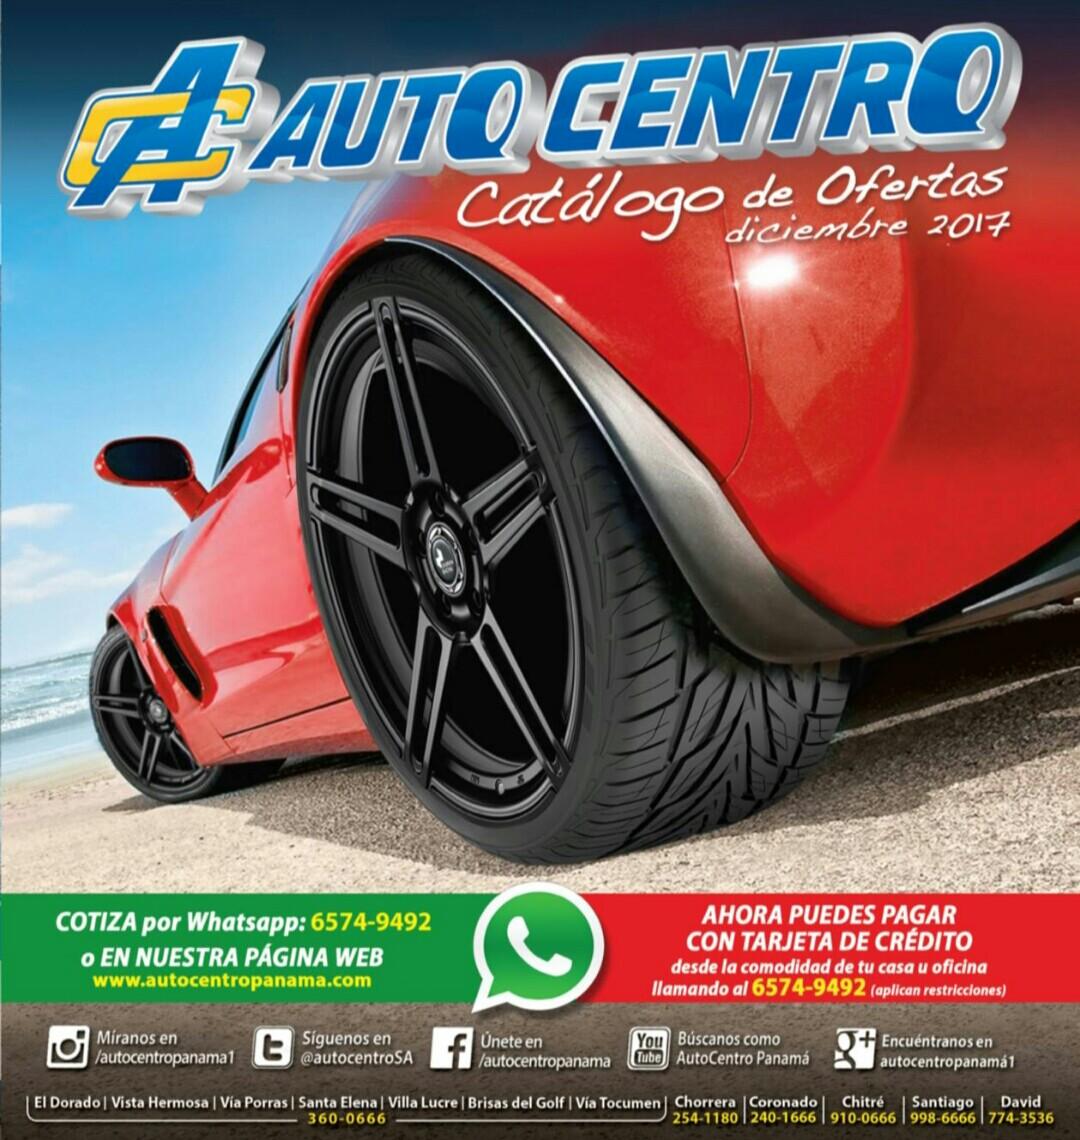 Catalogo Autocentro diciembre 2017 p1 (1)